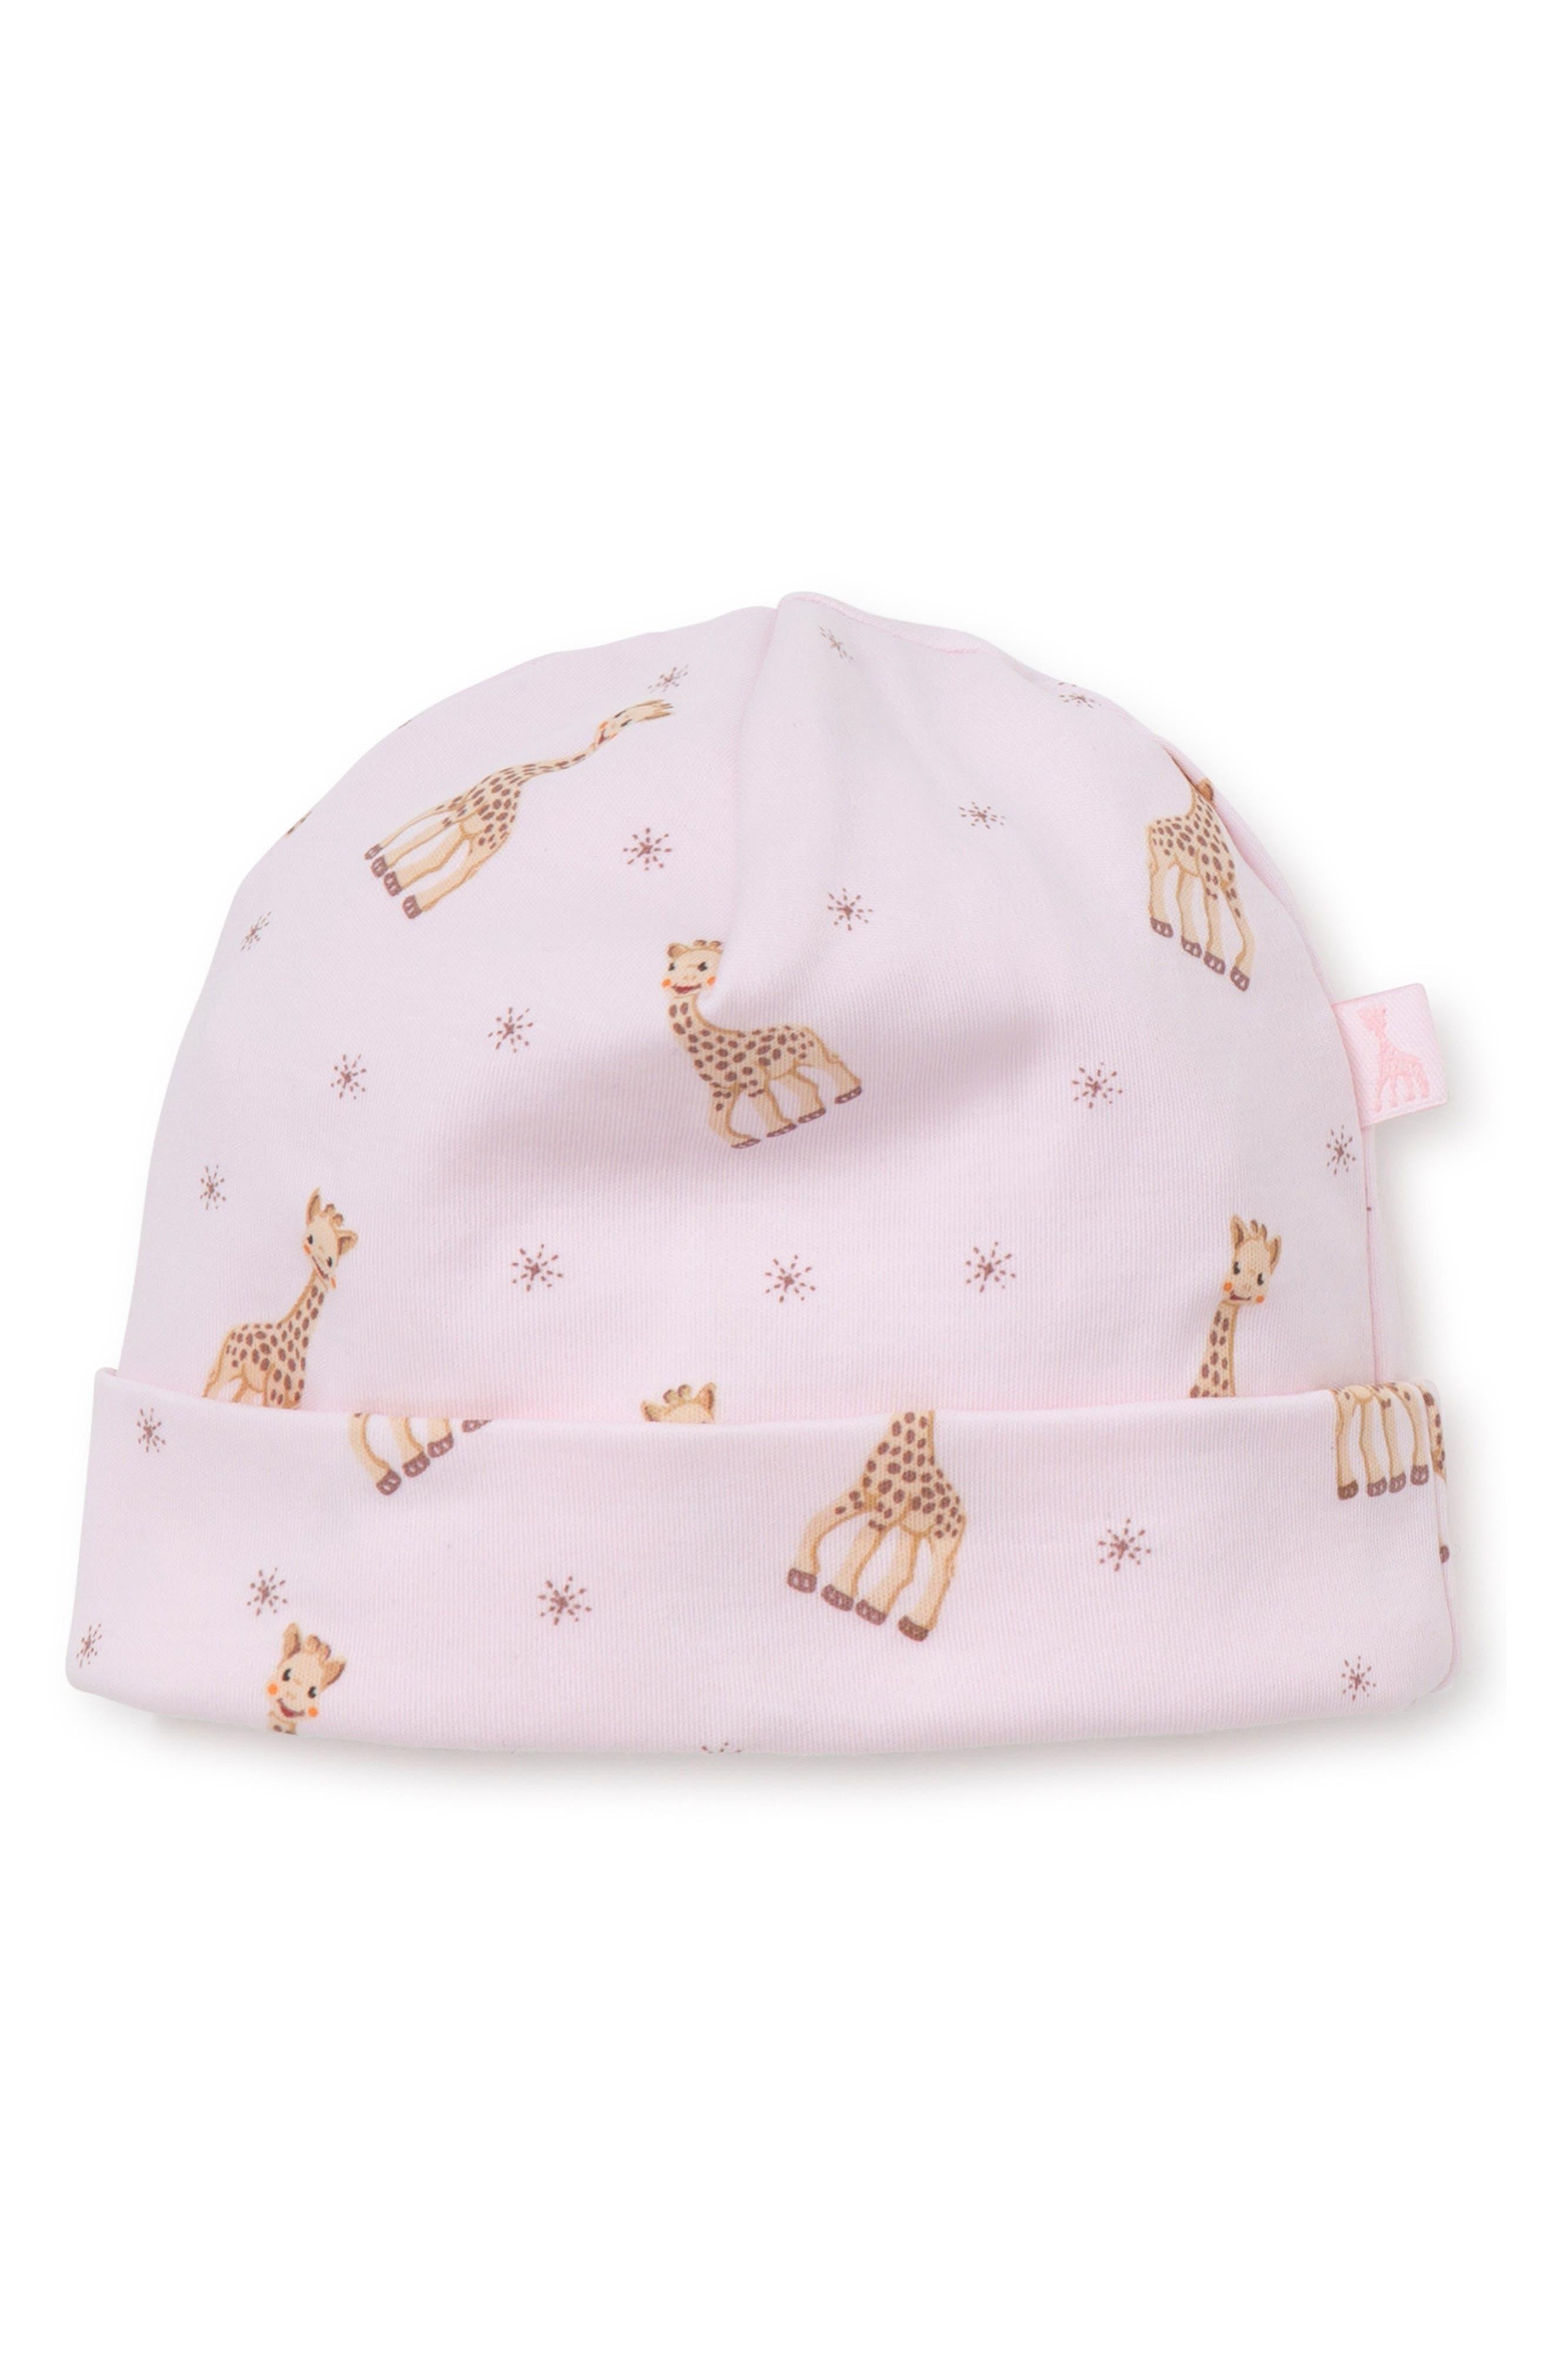 x Sophie la Girafe Beanie Hat,                             Main thumbnail 1, color,                             PINK